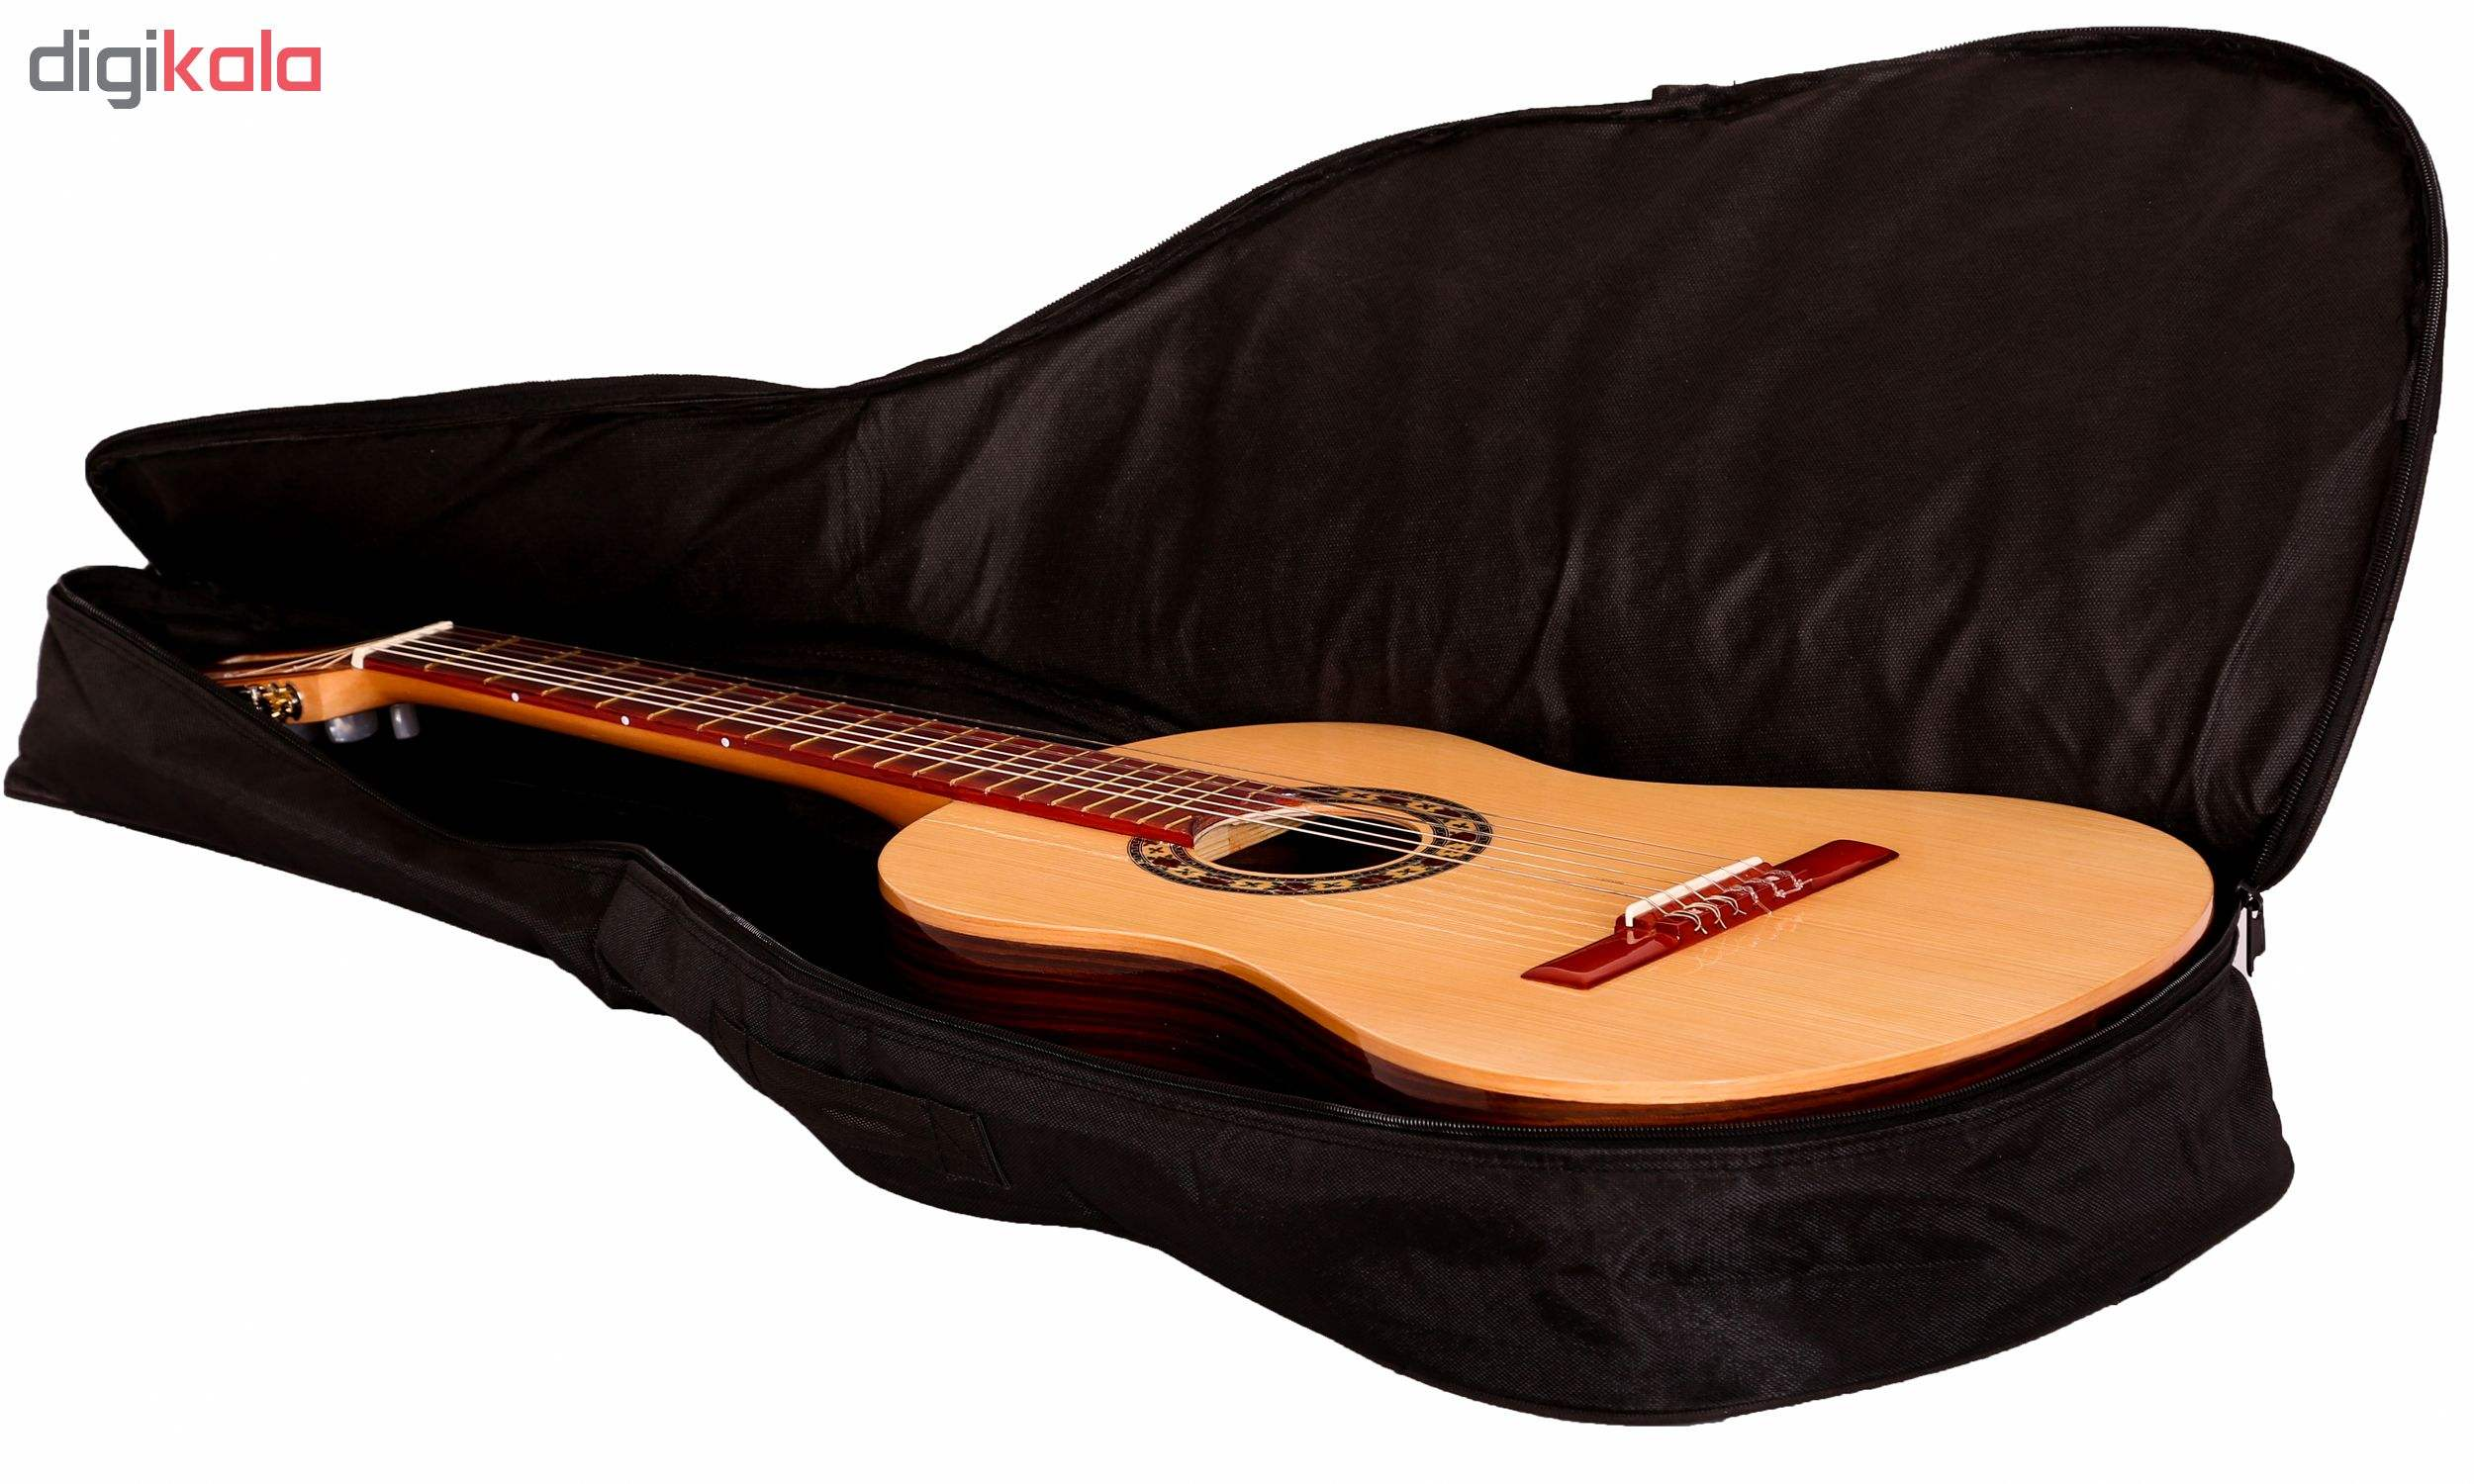 سافت کیس گیتار مدل G602 main 1 5